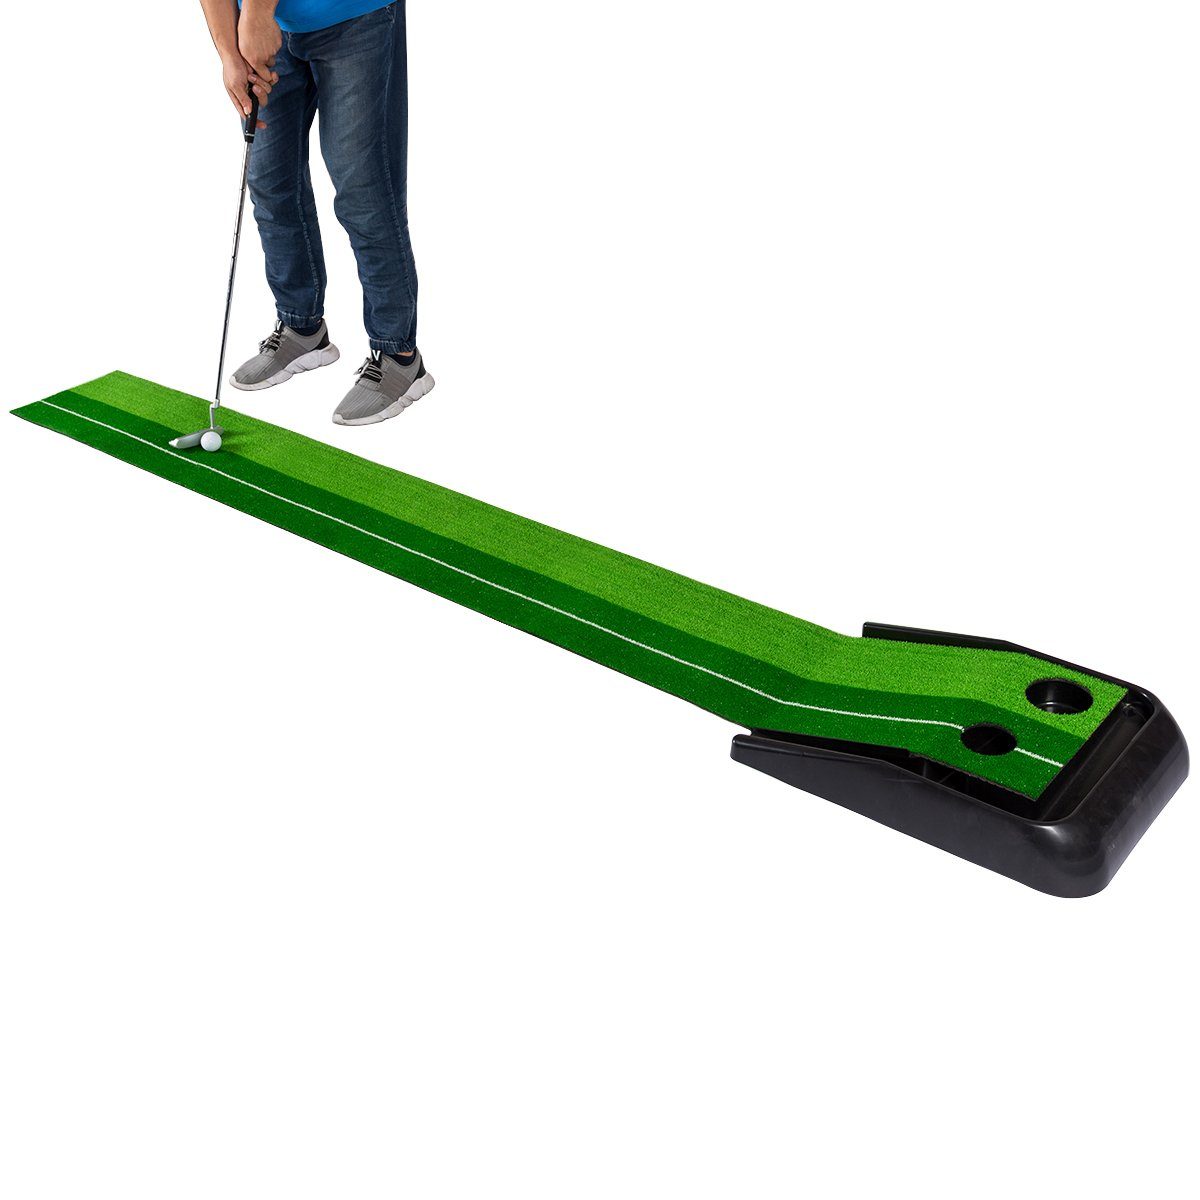 TANGKULA 8 FT Putting Mat Indoor Outdoor Golf Practice Training Mat Green Grass Turf Ball Return